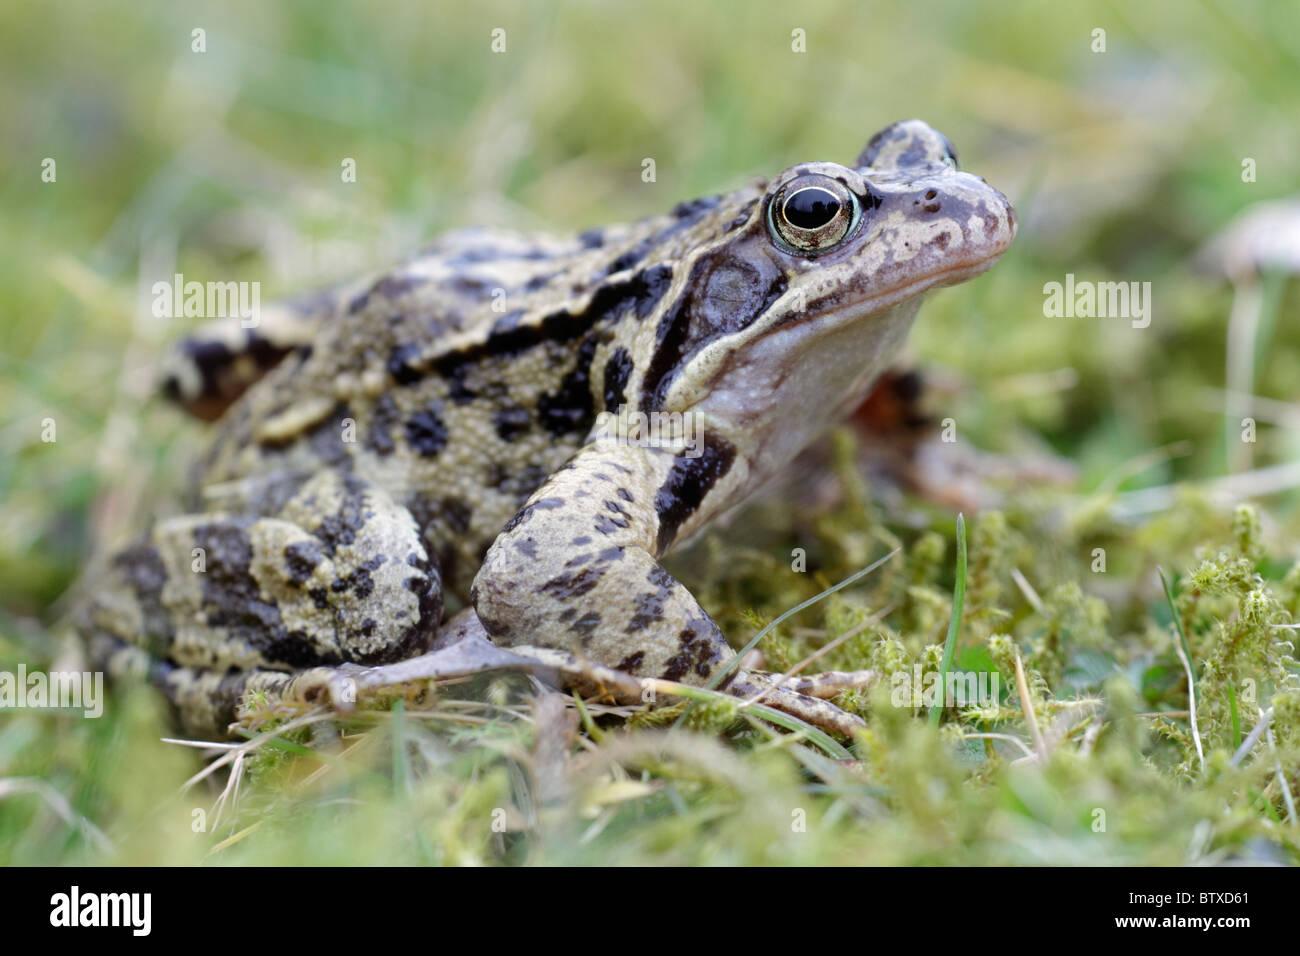 Common Frog (Rana temporaria), in garden, Germany - Stock Image